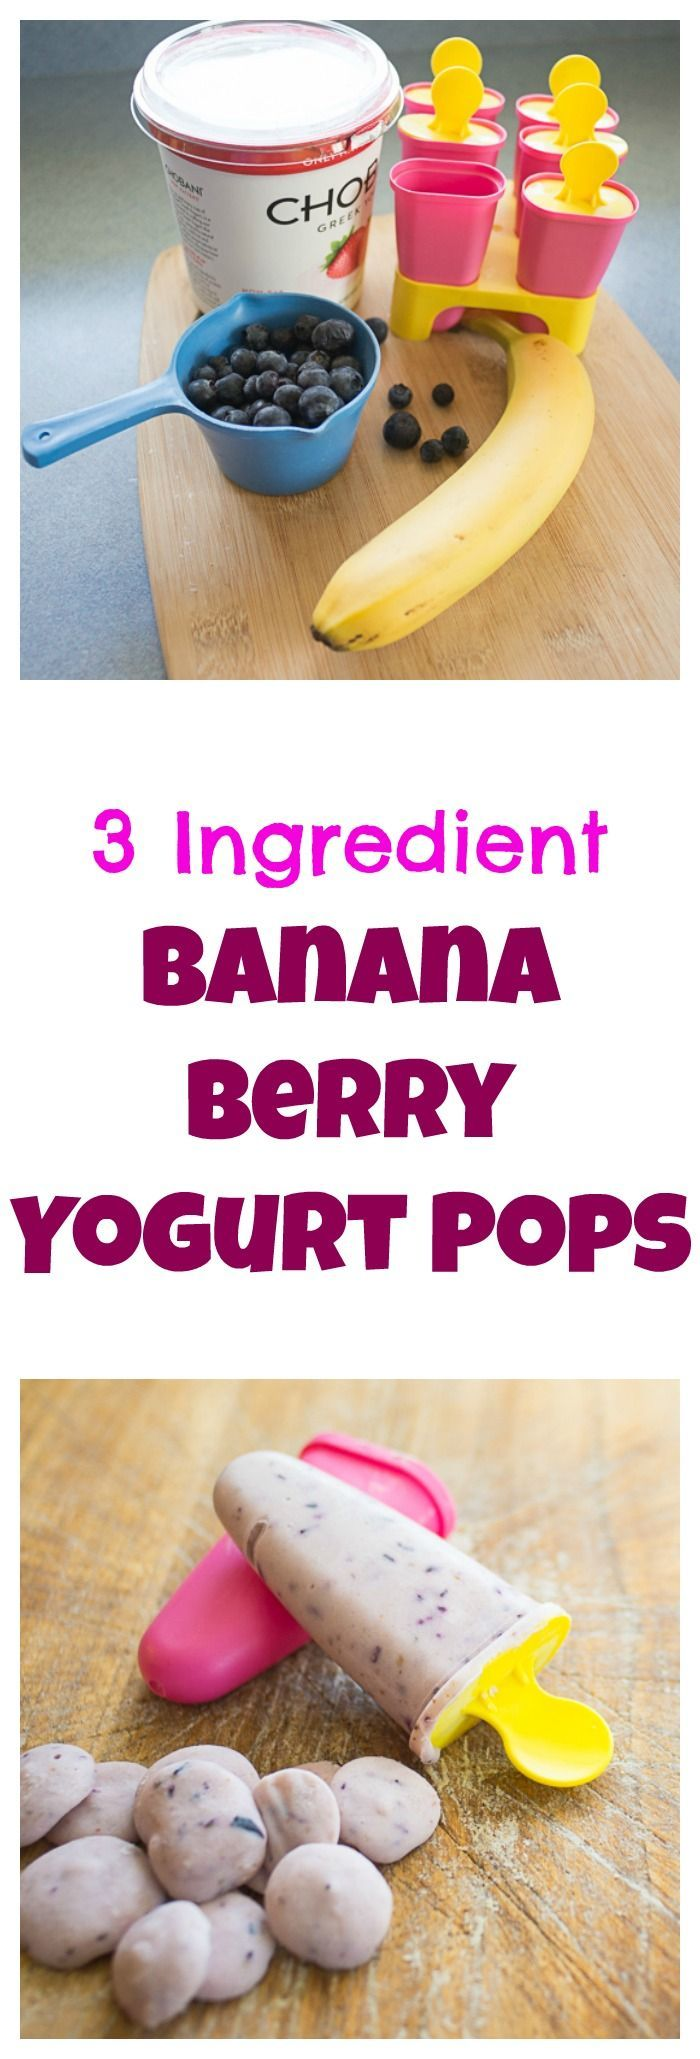 "Our kids favorite summer ""treat"" - healthy banana blueberry yogurt pops. http://bloggingwithapples.com"